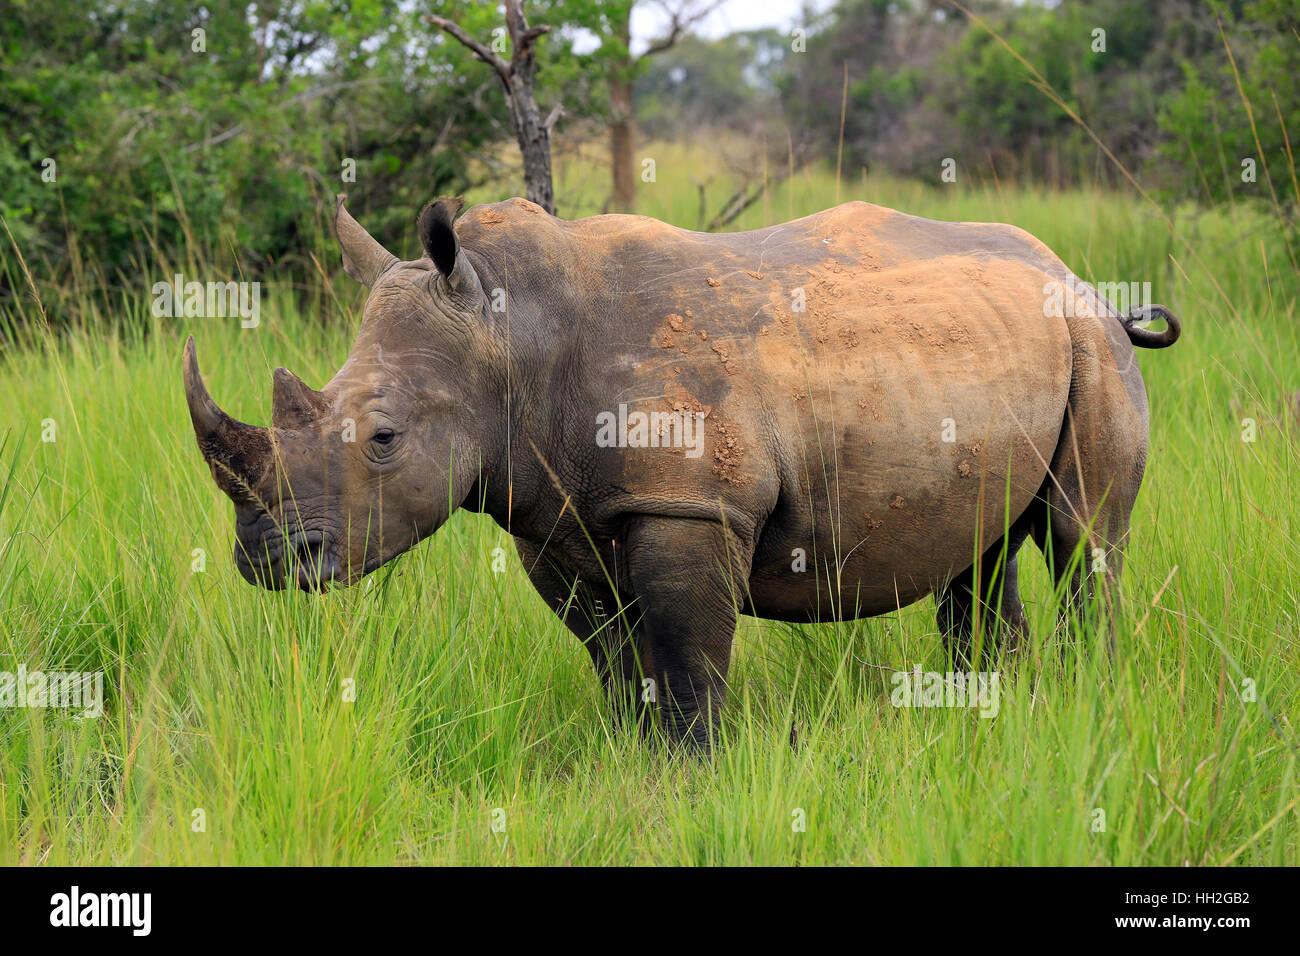 White Rhino (Ceratotherium simum). Rhino Trekking in Ziwa santuario di Rhino, Uganda Immagini Stock